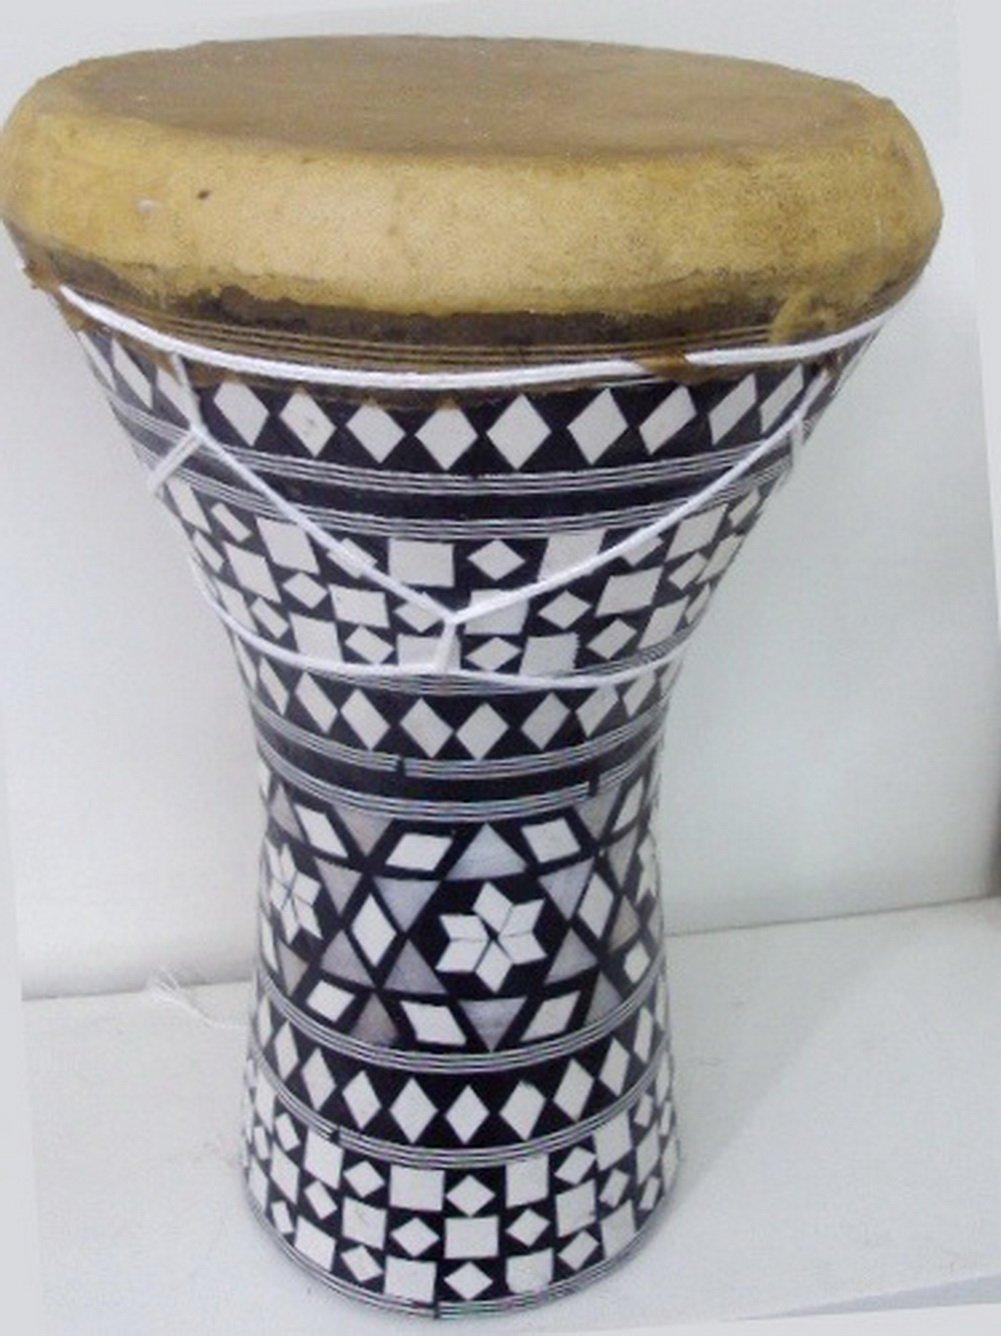 1PCS Large Egyptian Wooden Tabla Drum Doumbek Goat Skin Inlaid Handmade 11'' by bonballoon